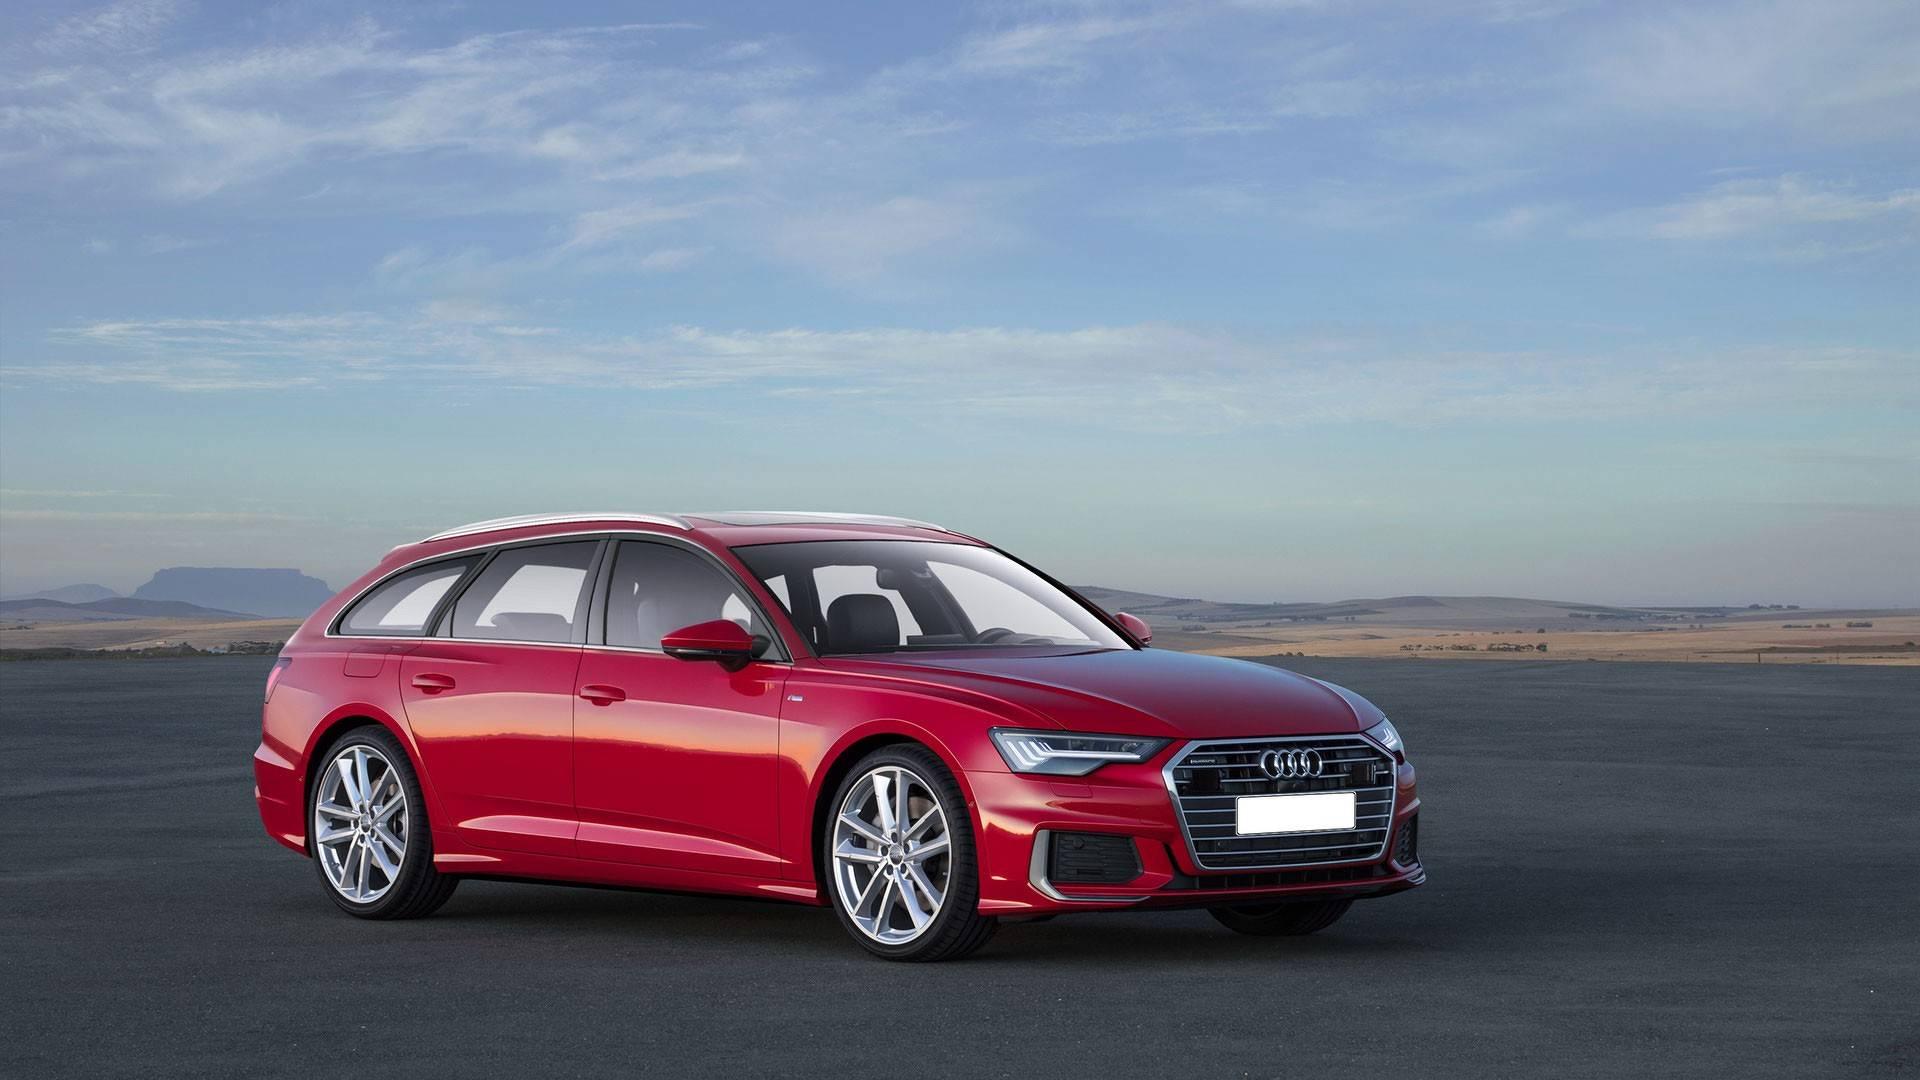 Audi A6 Avant, A6 Allroad RS6 Avant Renderings (1)